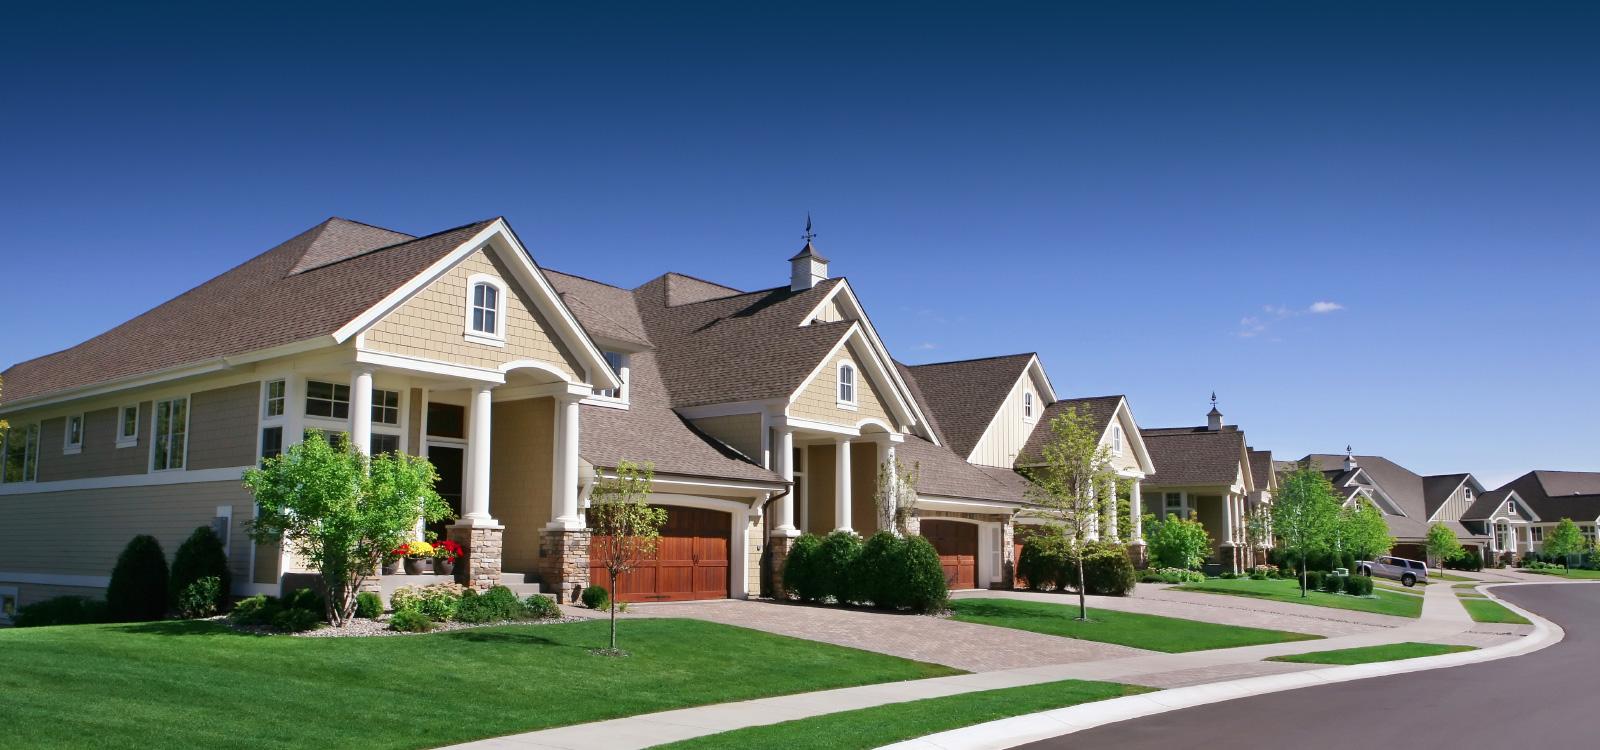 Home Inspection Checklist in Lebanon